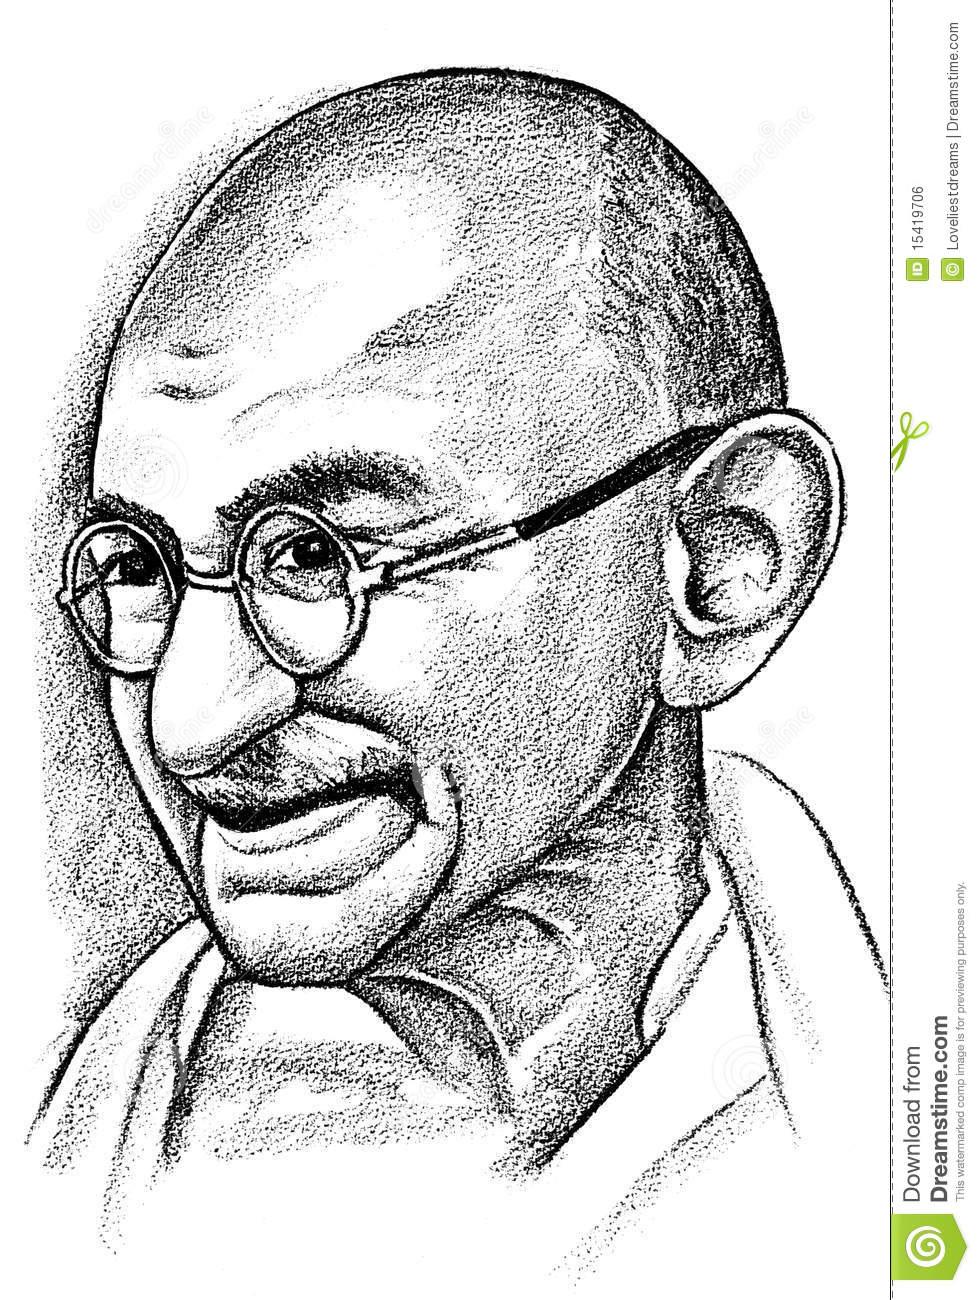 Mahatma gandhi clipart png royalty free library Mahatma Gandhi Outline Sketch Gandhi Clipart – Clipground ... png royalty free library